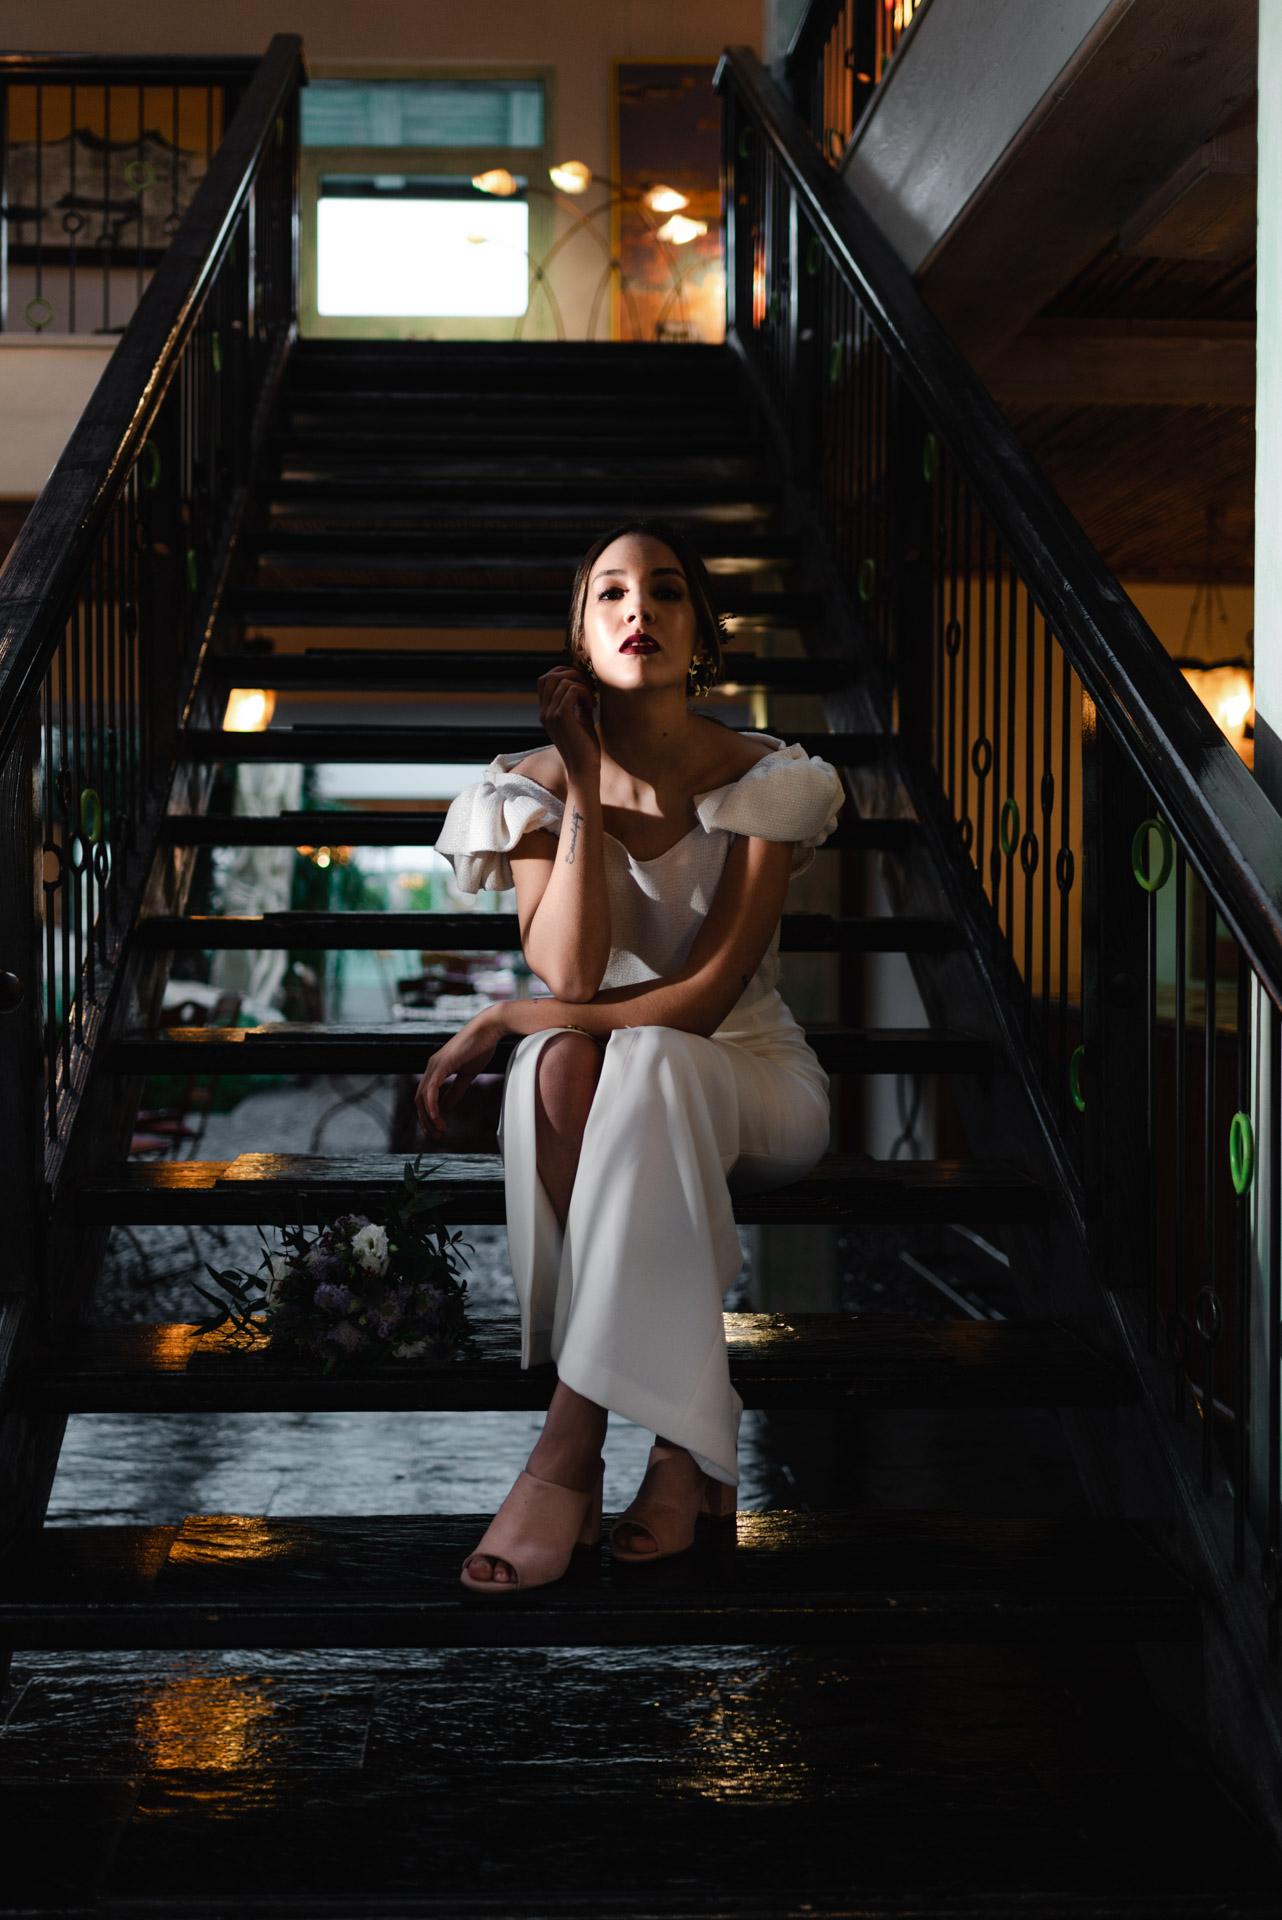 Editorial de boda en la Casa Verde de Torrelodones - Crazy Love Shots - Fotógrafo de boda Madrid - Pipa Comunicación - Lamaryé - Piropo Jewels - Tocados Mariana - Desmarkarte - Green Collective - Bamboleo Quiero - Momento para el Chachachá